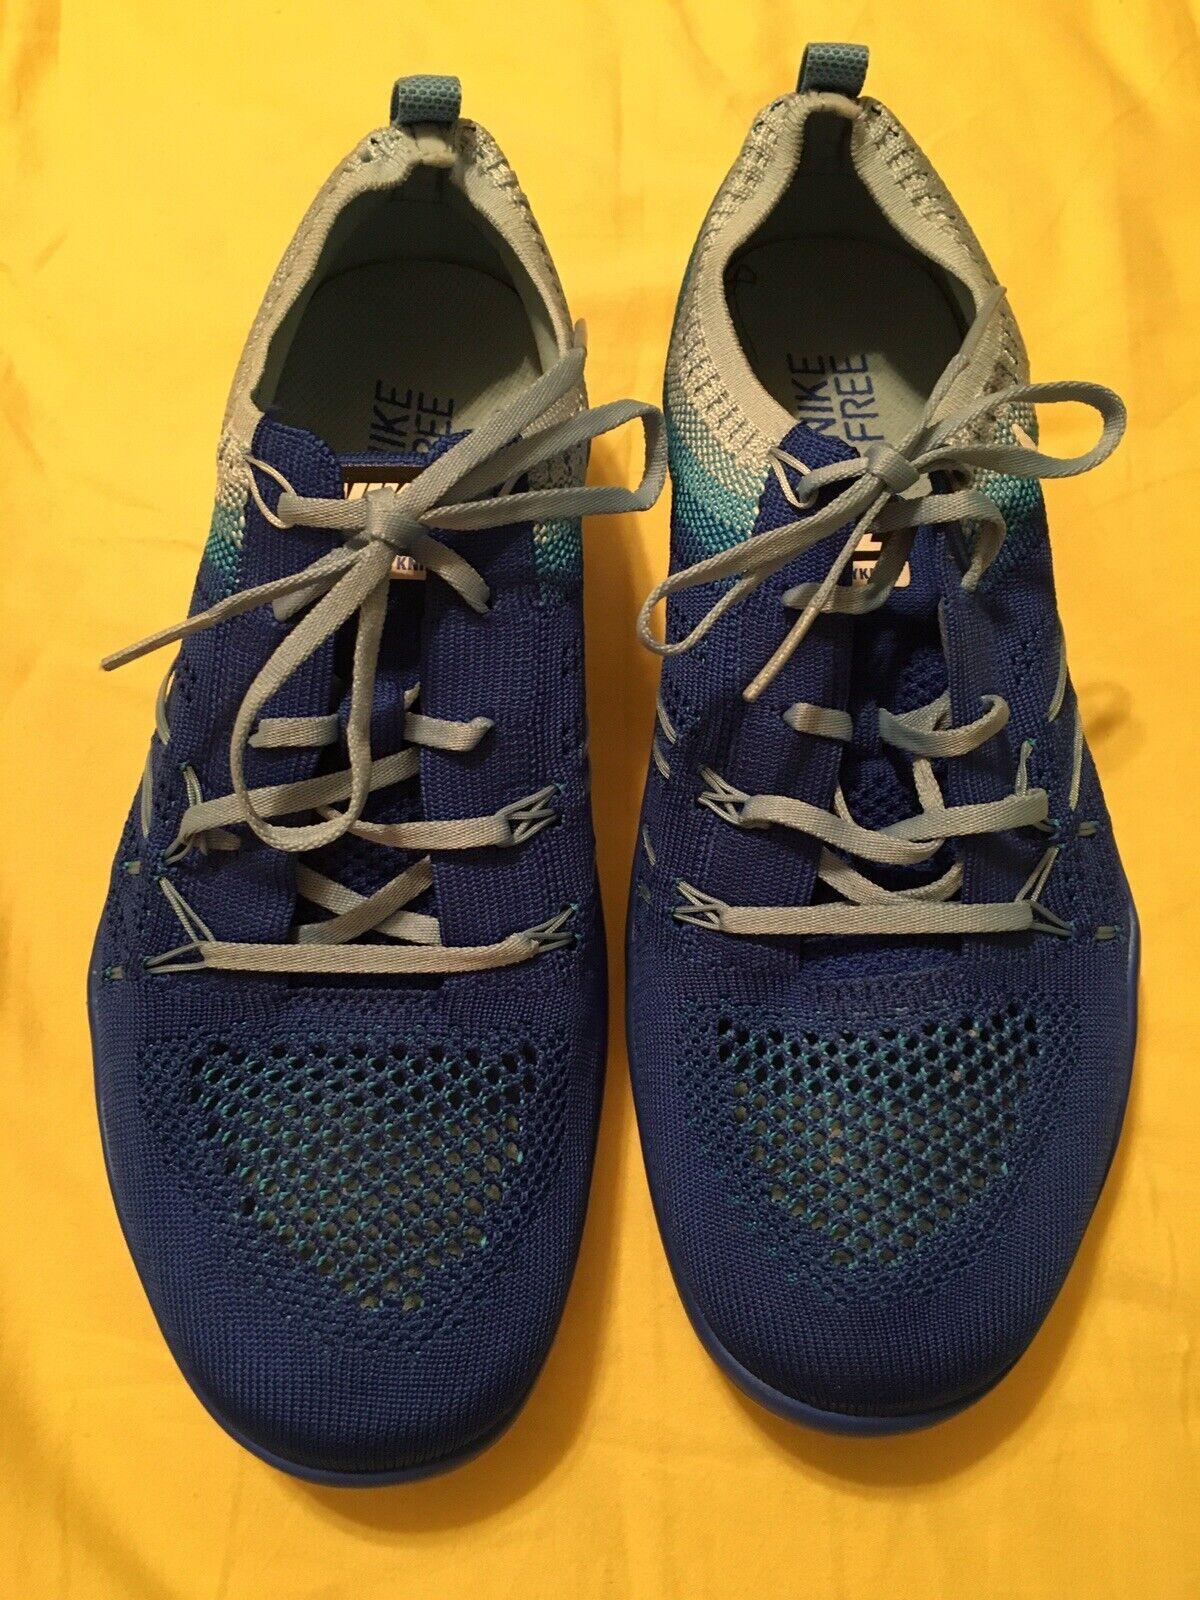 cfacf198587c Nike Womens Size 9.5 9.5 9.5 Sneakers 8c9bc1 - slippers ...